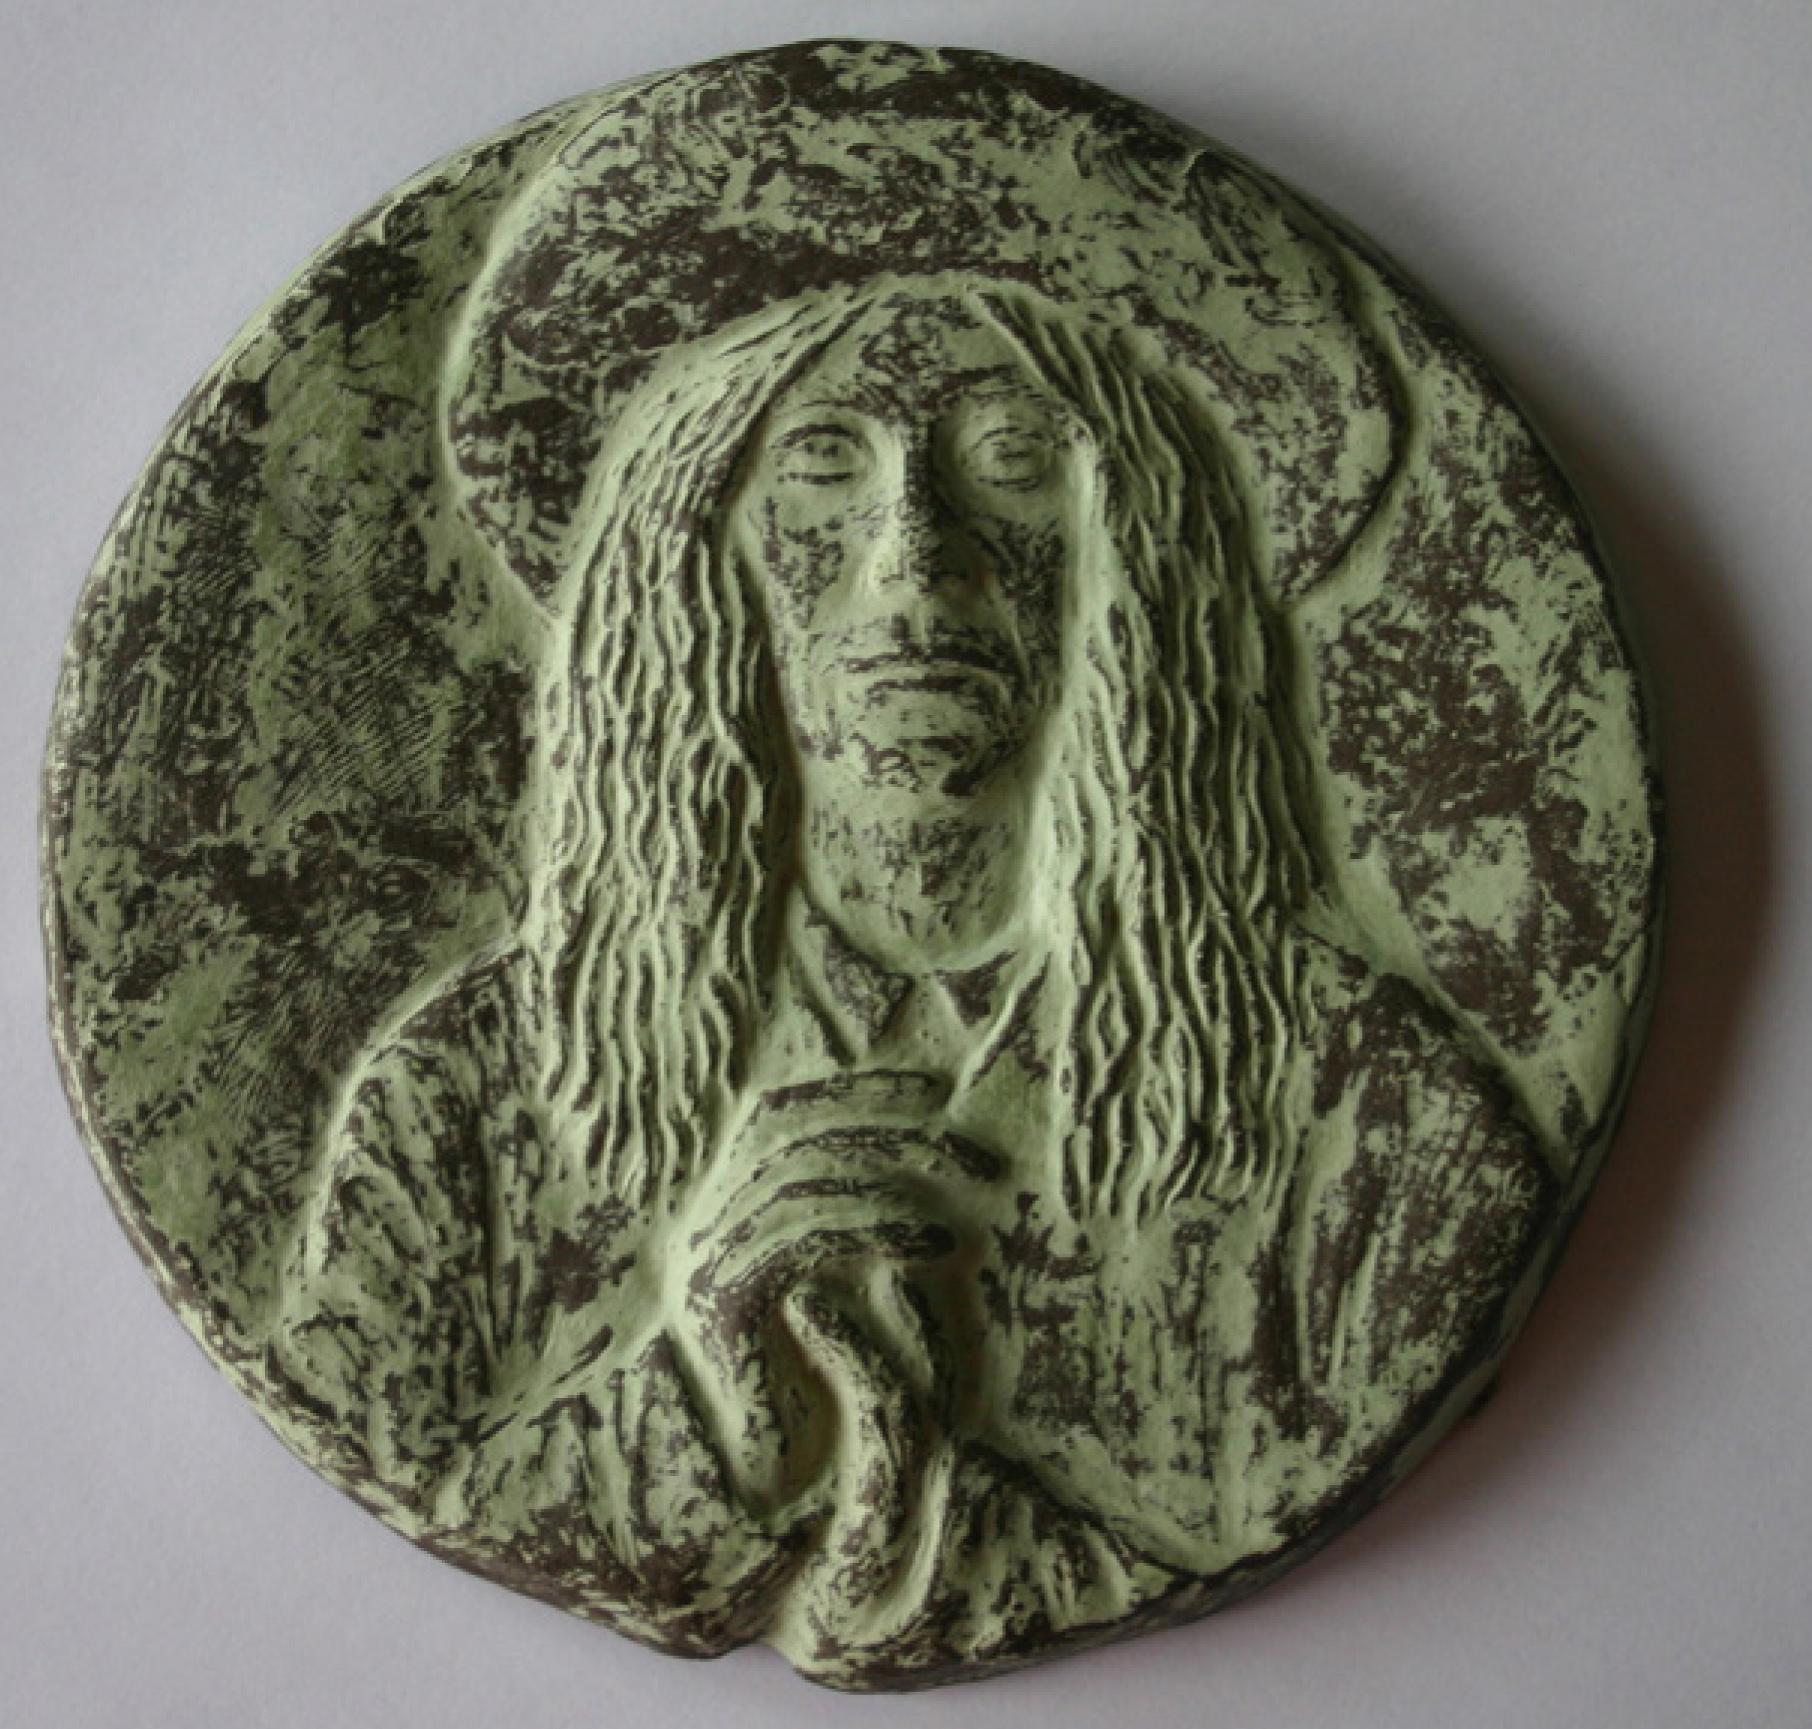 3 | Christa Donner | P.S. | Plakette | 2017 | Terracotta engobiert | Durchmesser 13 cm | Kunstlotterie